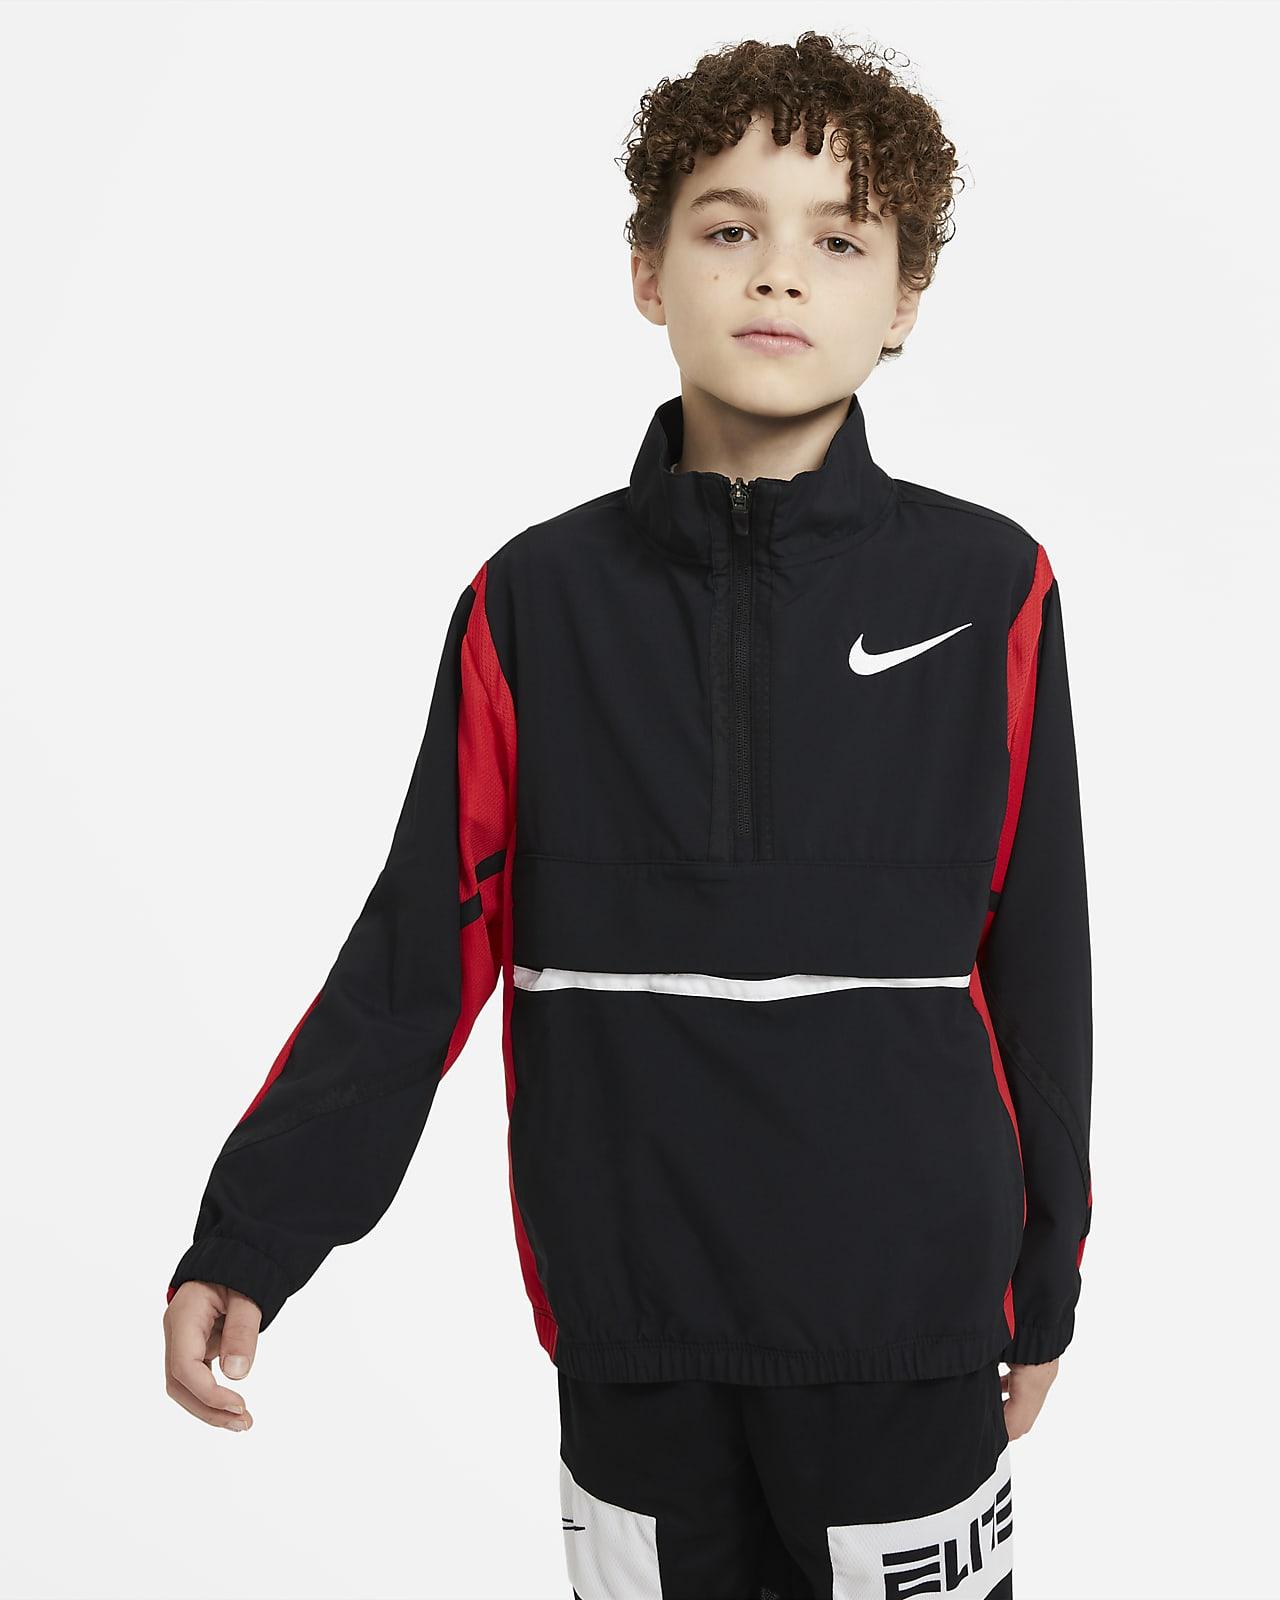 Nike Crossover Chaqueta de baloncesto - Niño